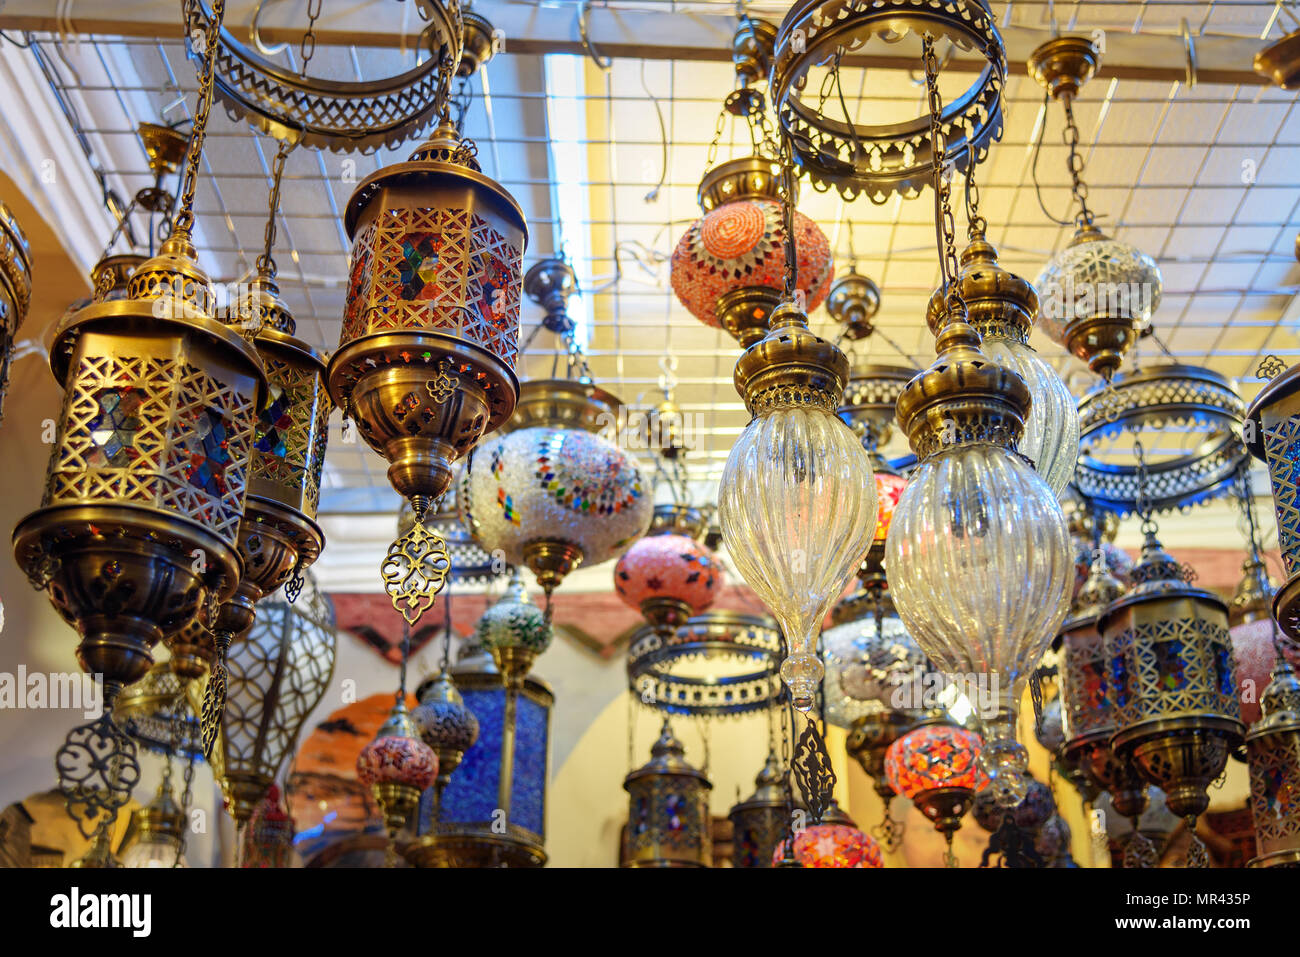 Tradizionali Orientali Lampade Colorate Lanterne Baku Azerbaigian